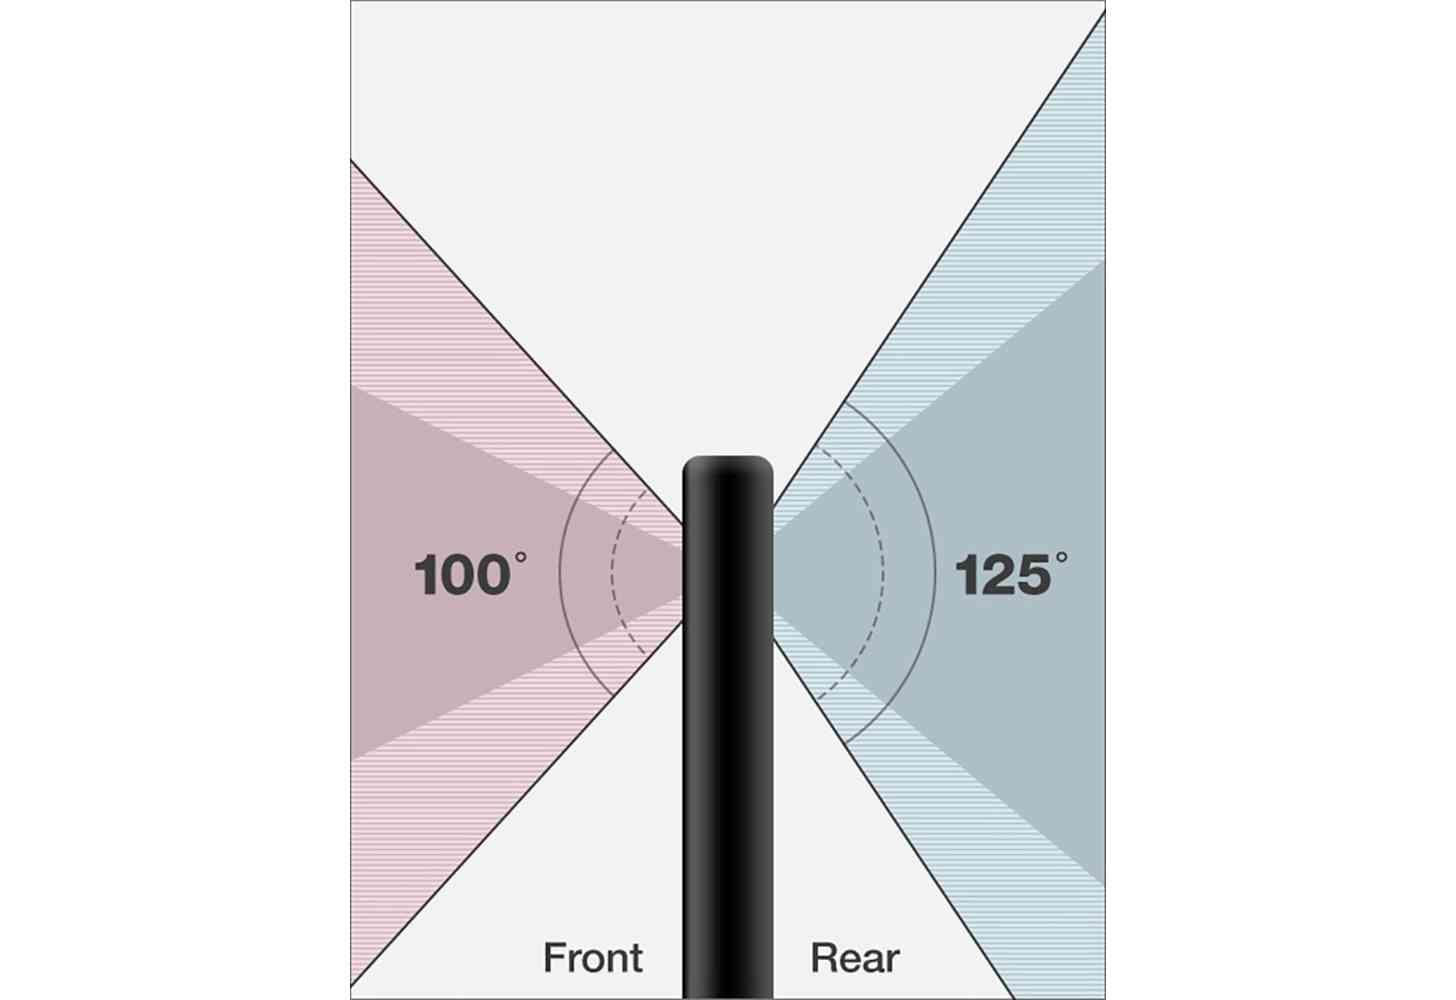 LG G6 wide angle camera